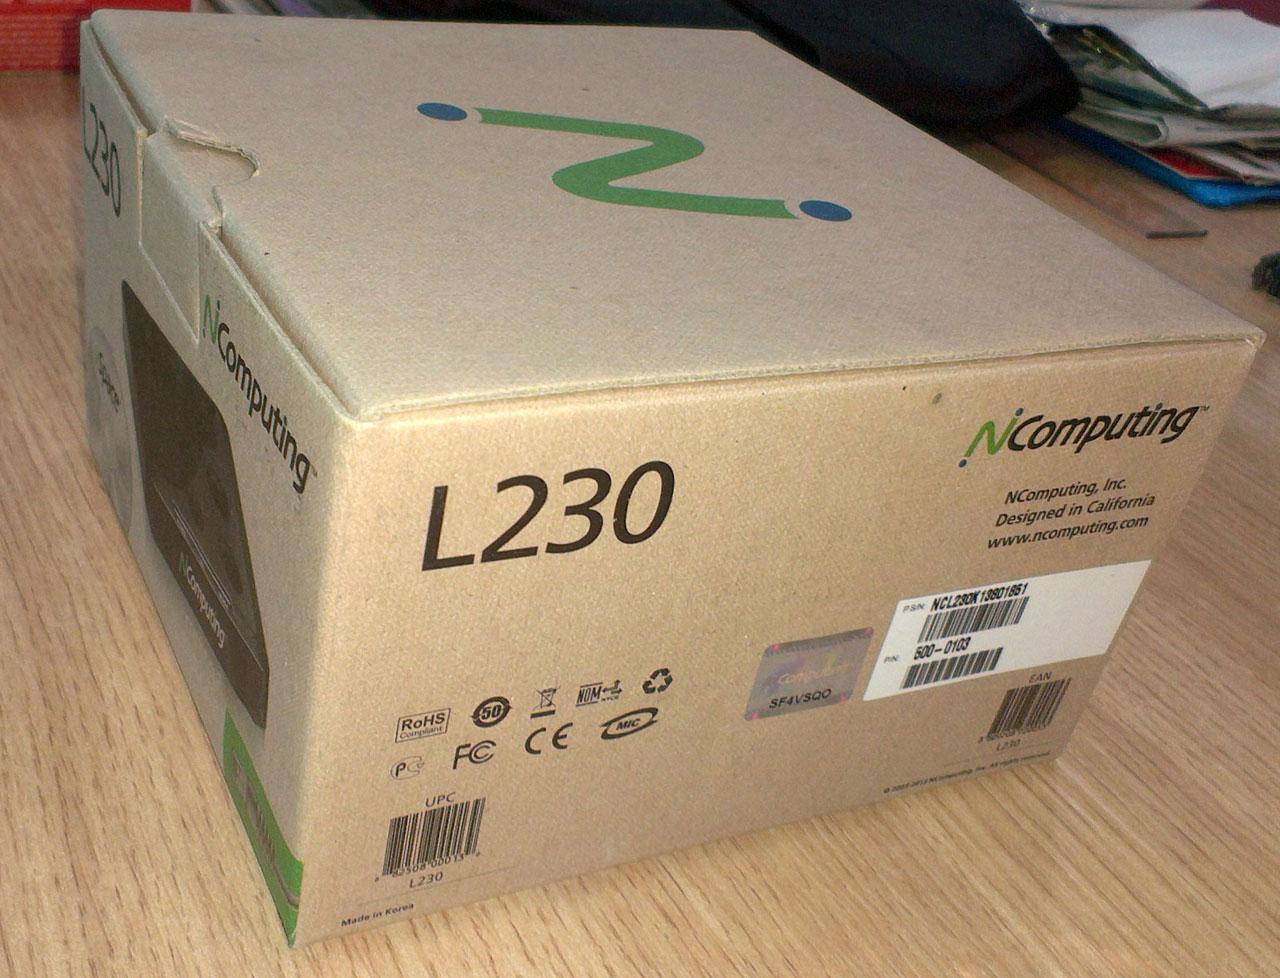 已停产-NComputing第1代经典款 L130(PS2接口,无USB口)